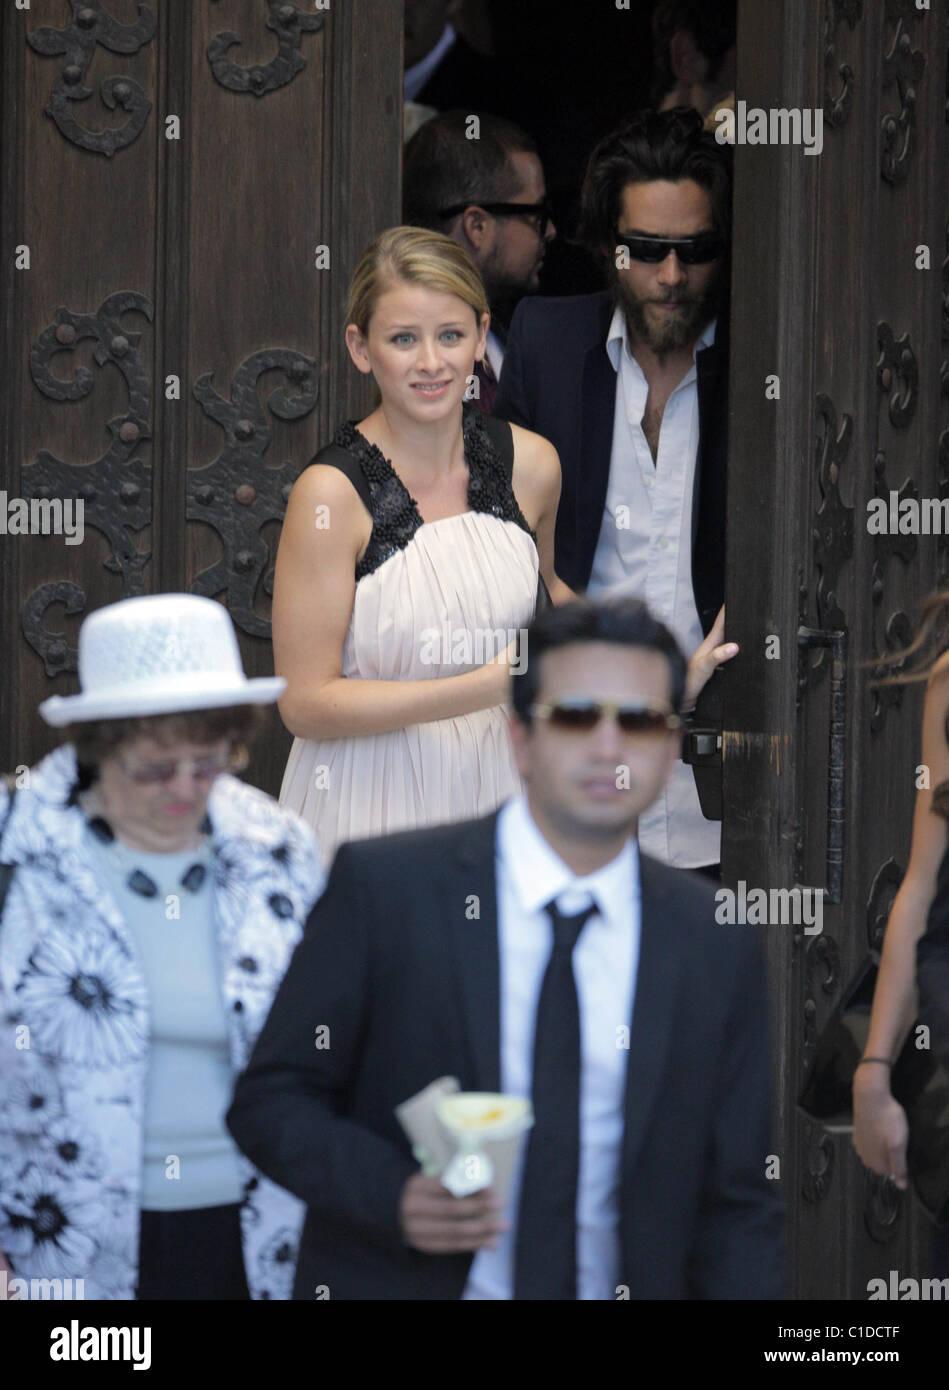 Lauren Bosworth The Hills Stars Spencer Pratt And Heidi Montag Get Stock Photo 35330863 Alamy